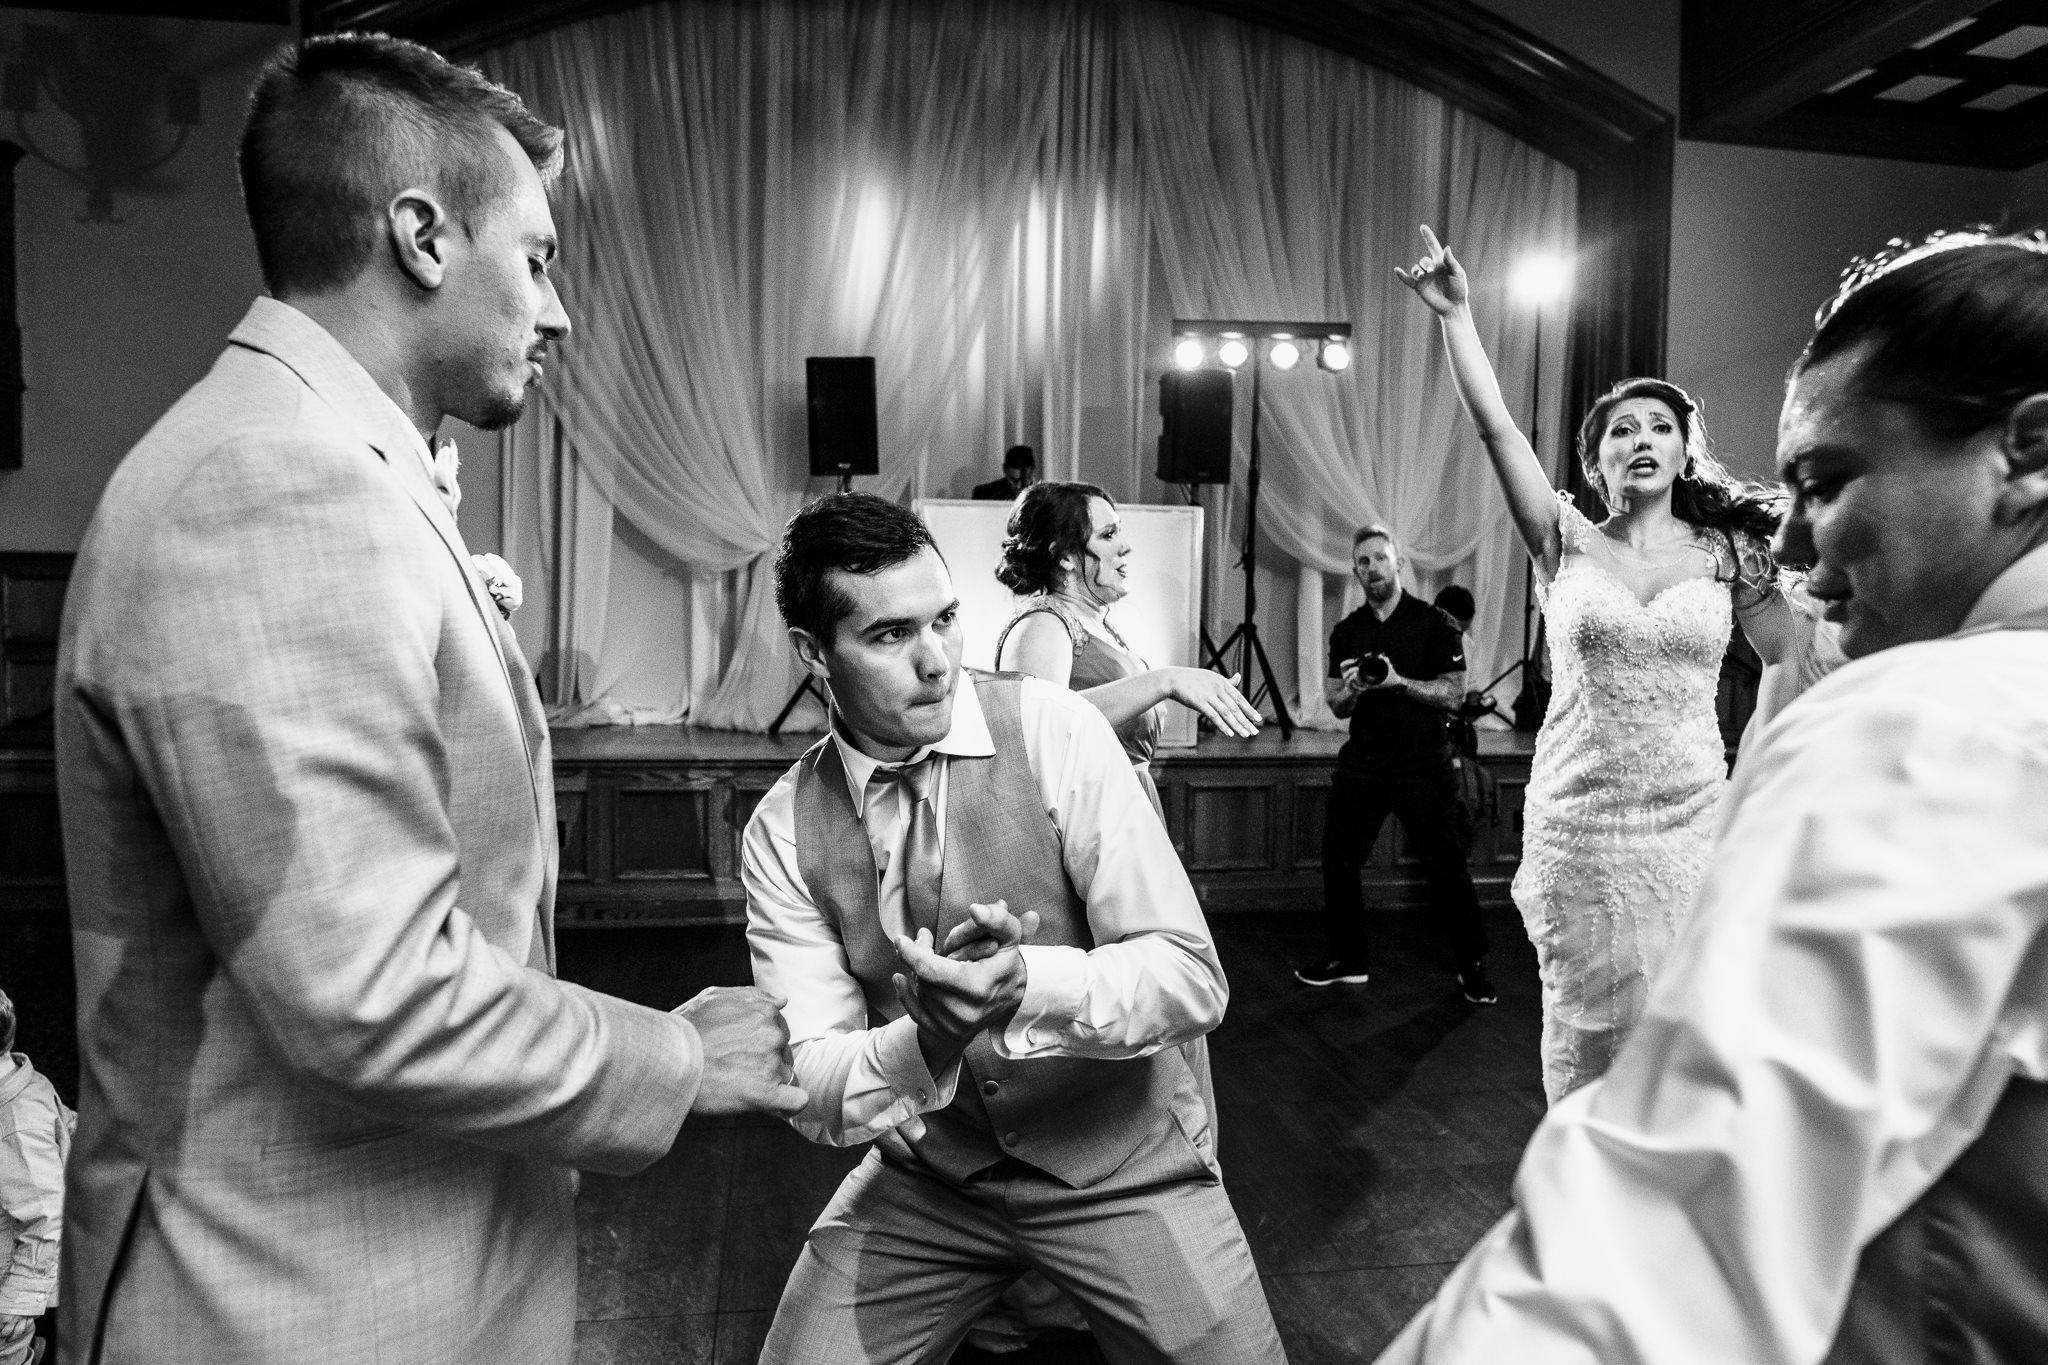 Barbato-Moorestown-Community-House-Wedding-New-Jersey-Photographer-43.JPG